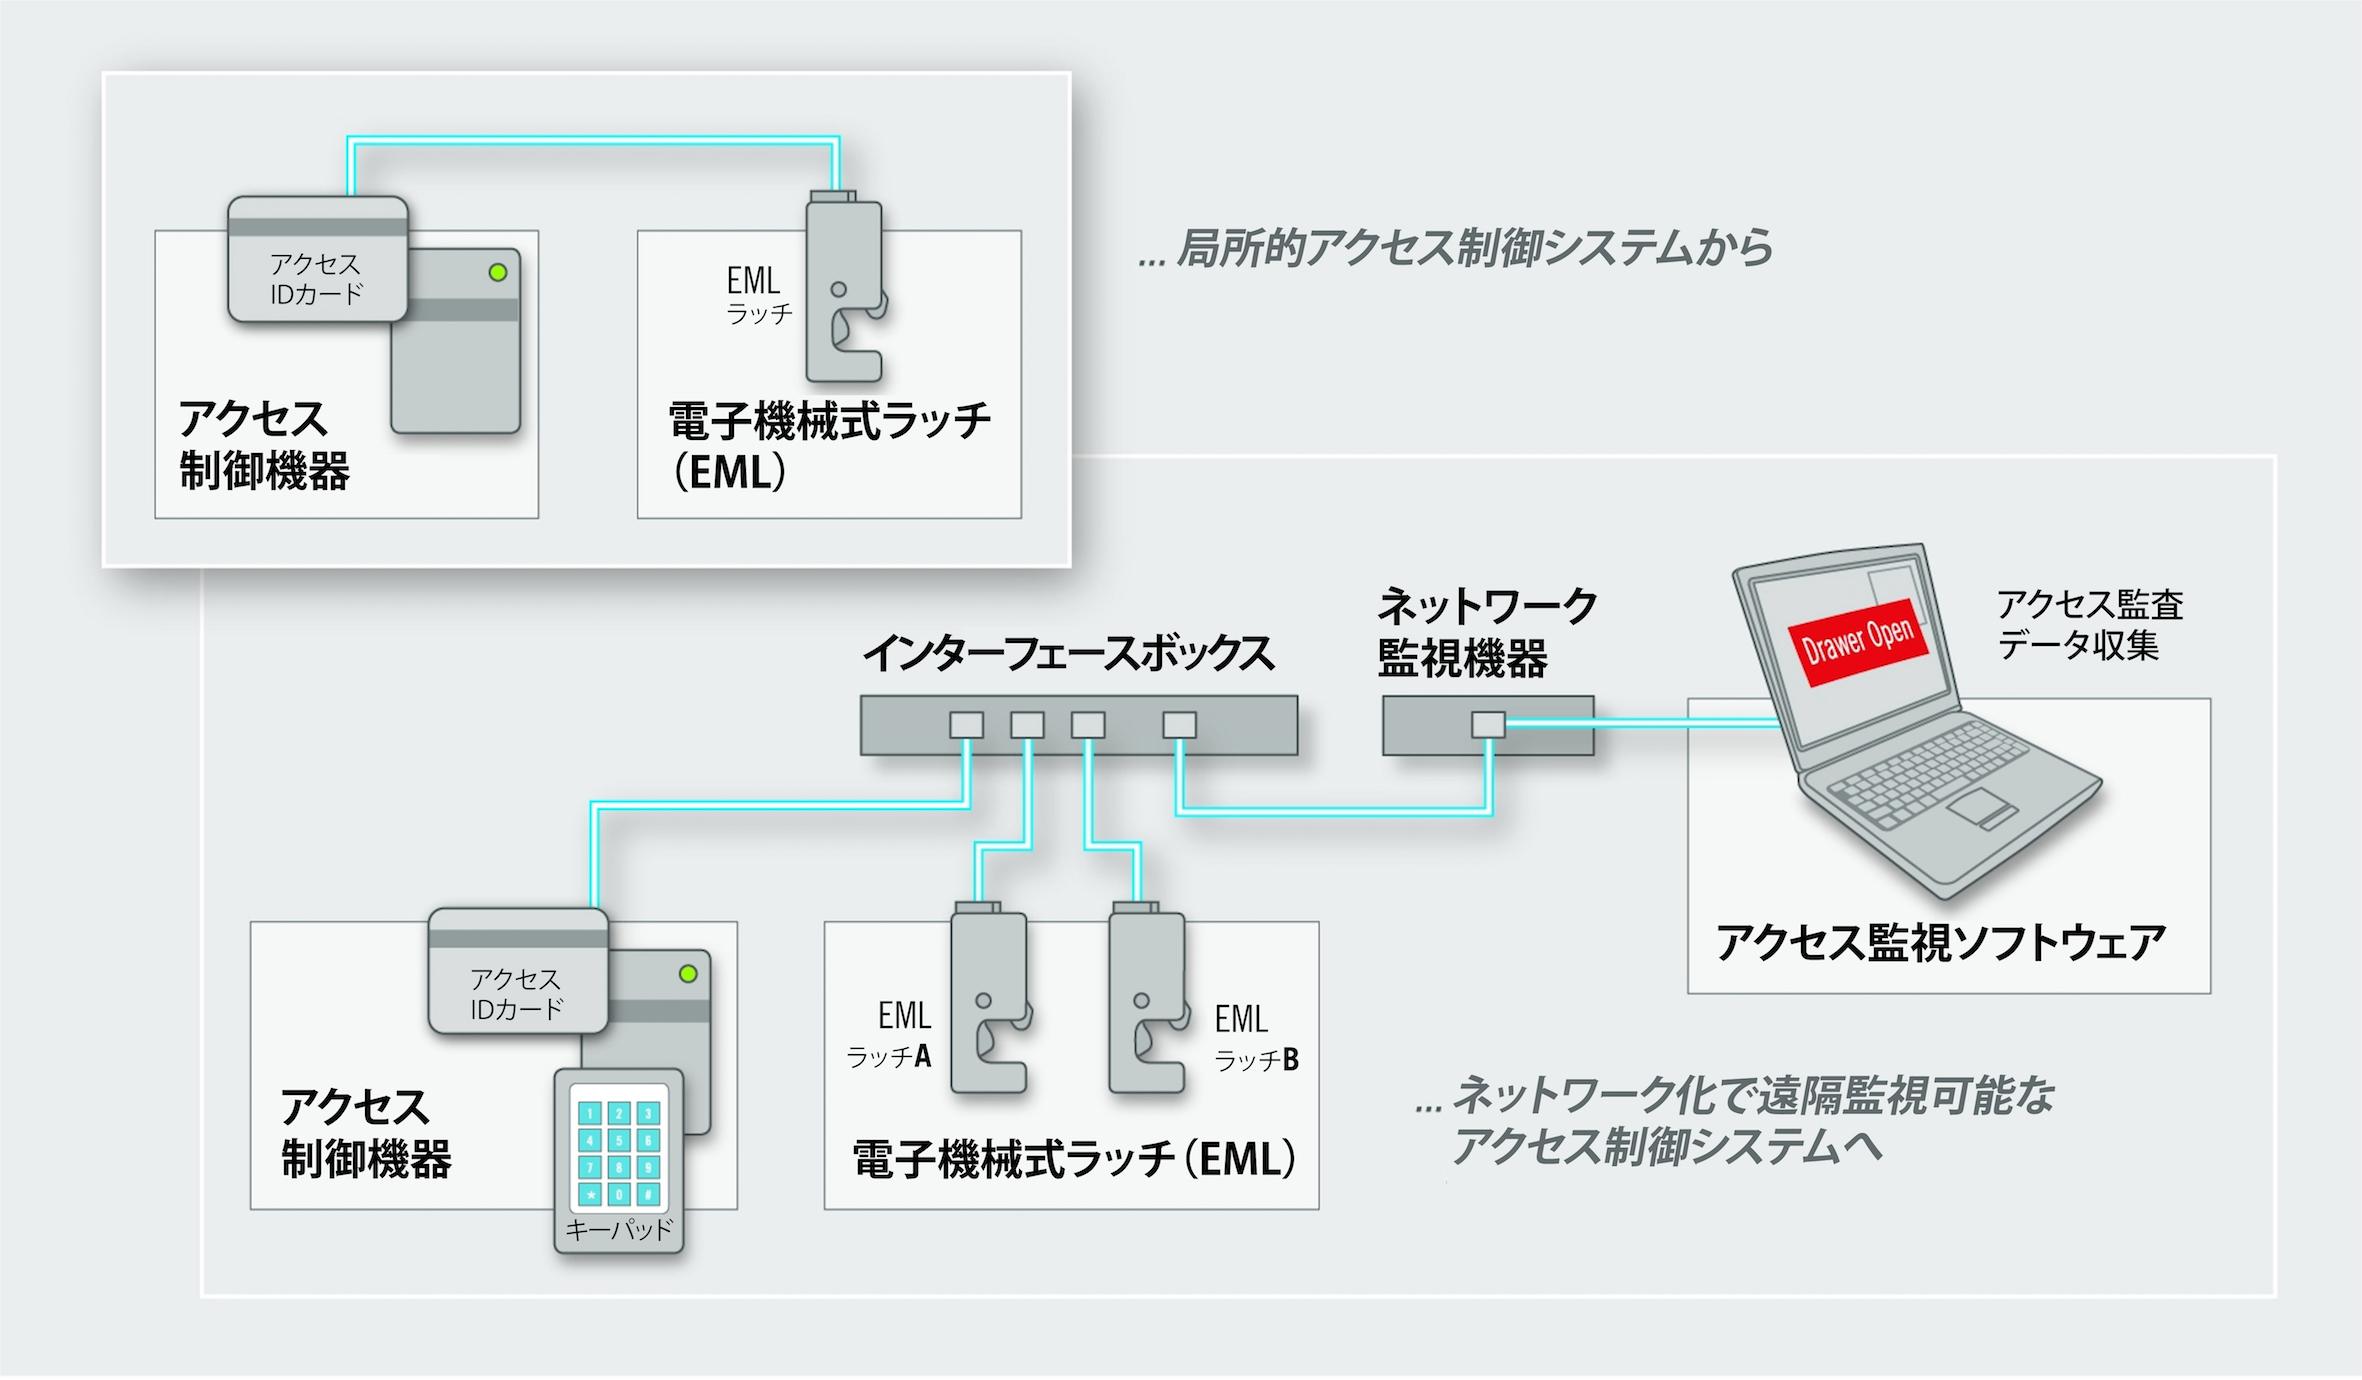 Southco-EASsystem